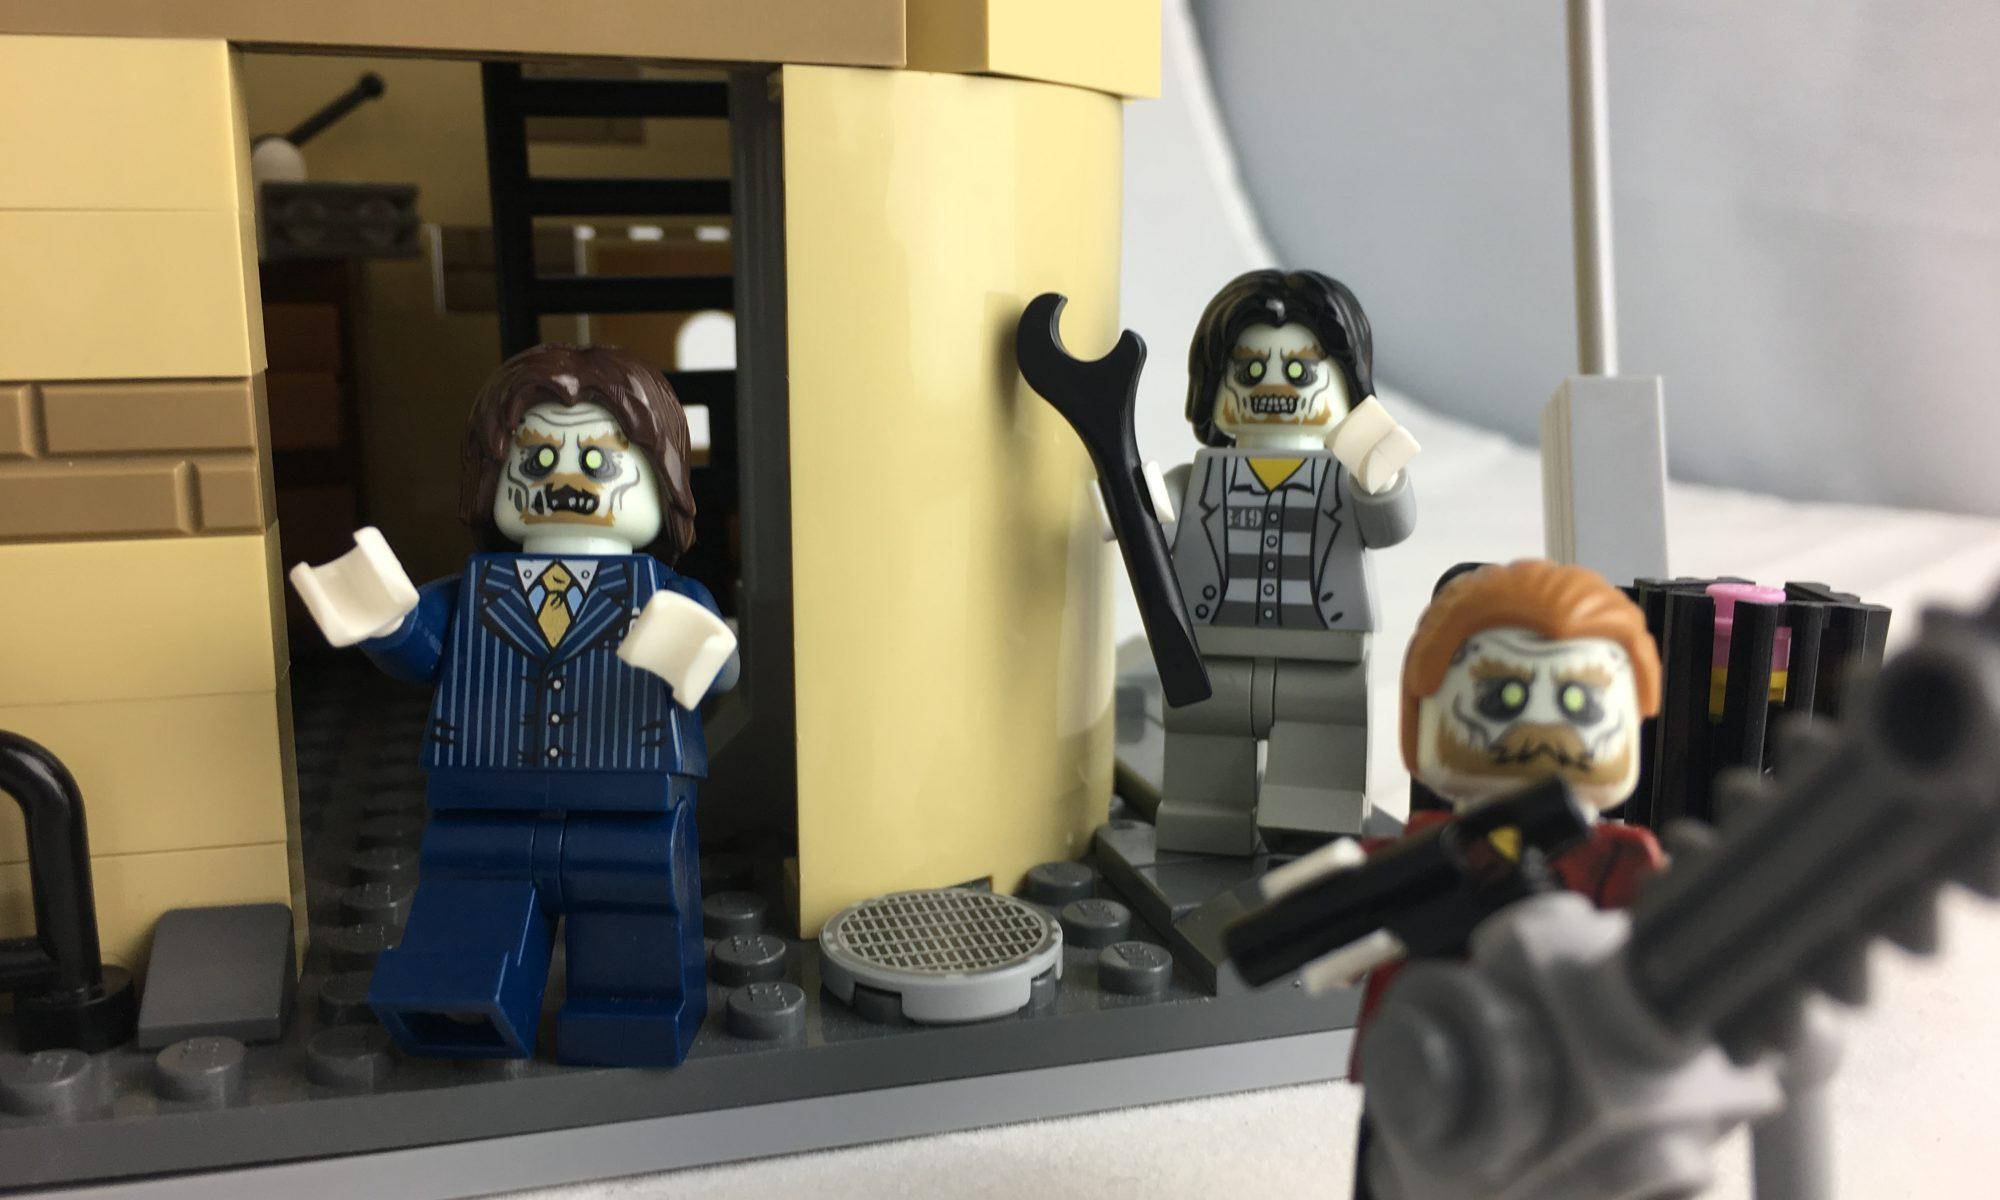 лего зомби апокалипсис игрушки картинки слухам, причиной